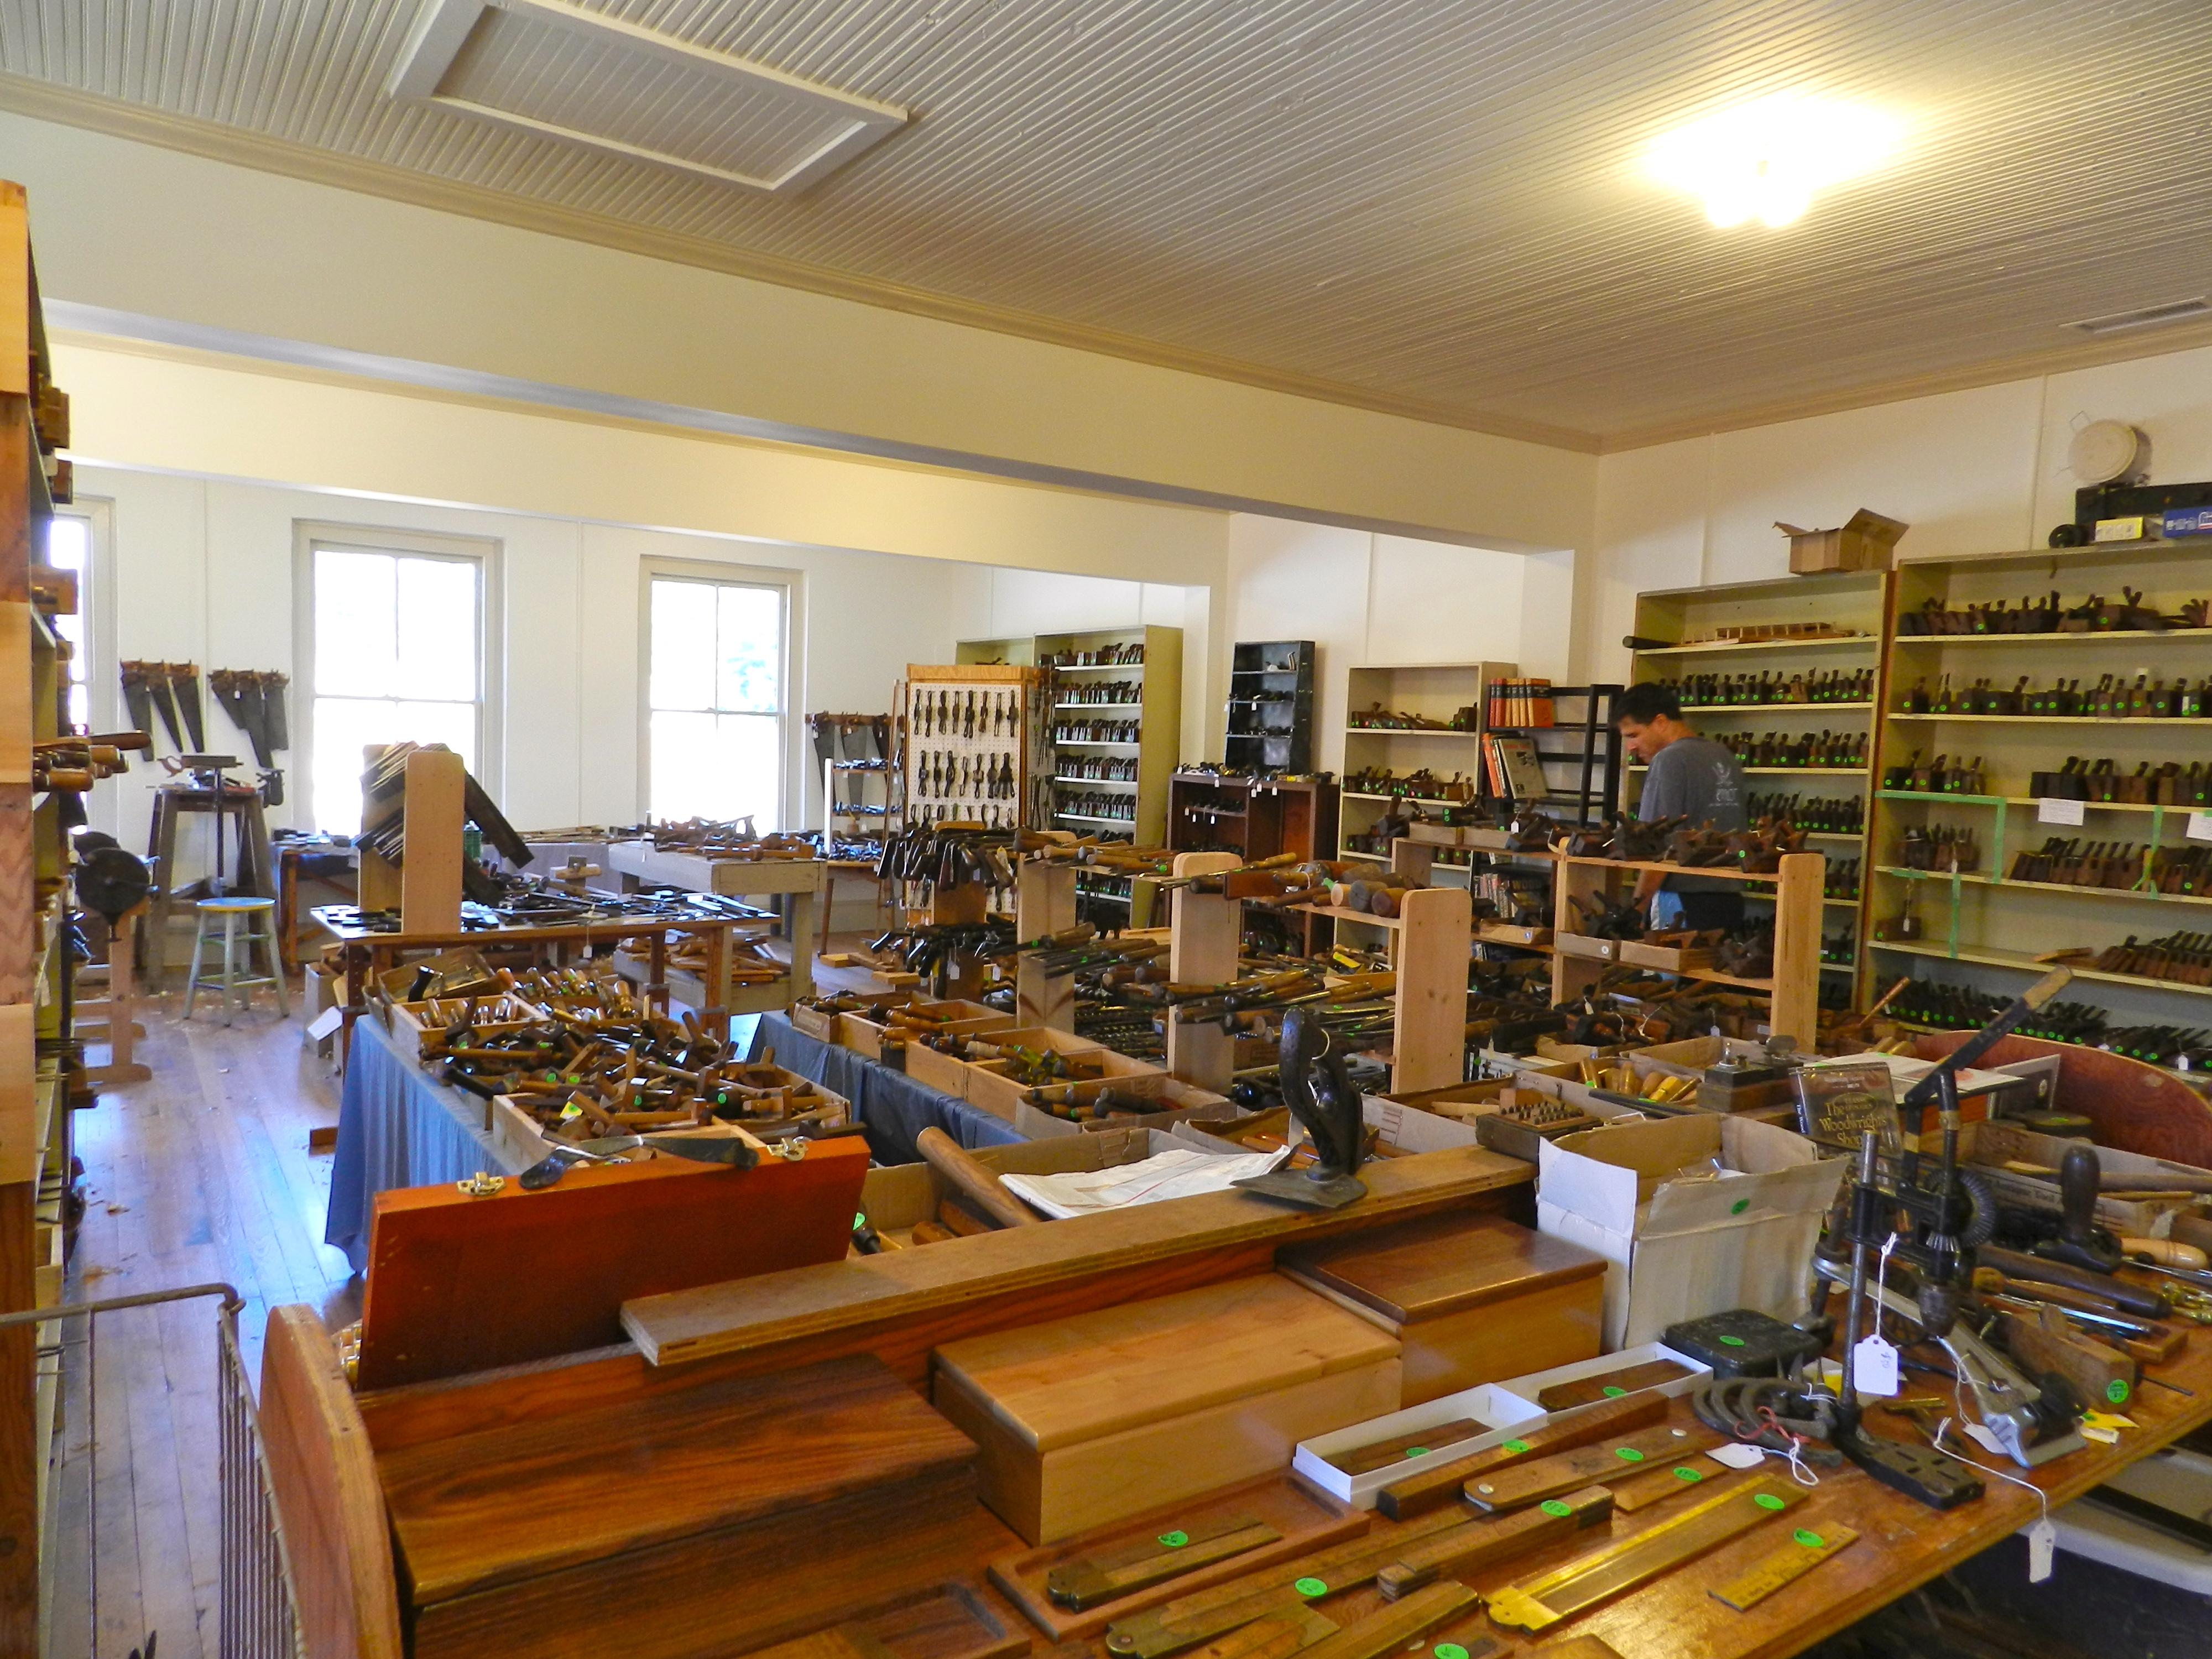 Juli 2016 Woodworking Plan For Storage Bench Seat